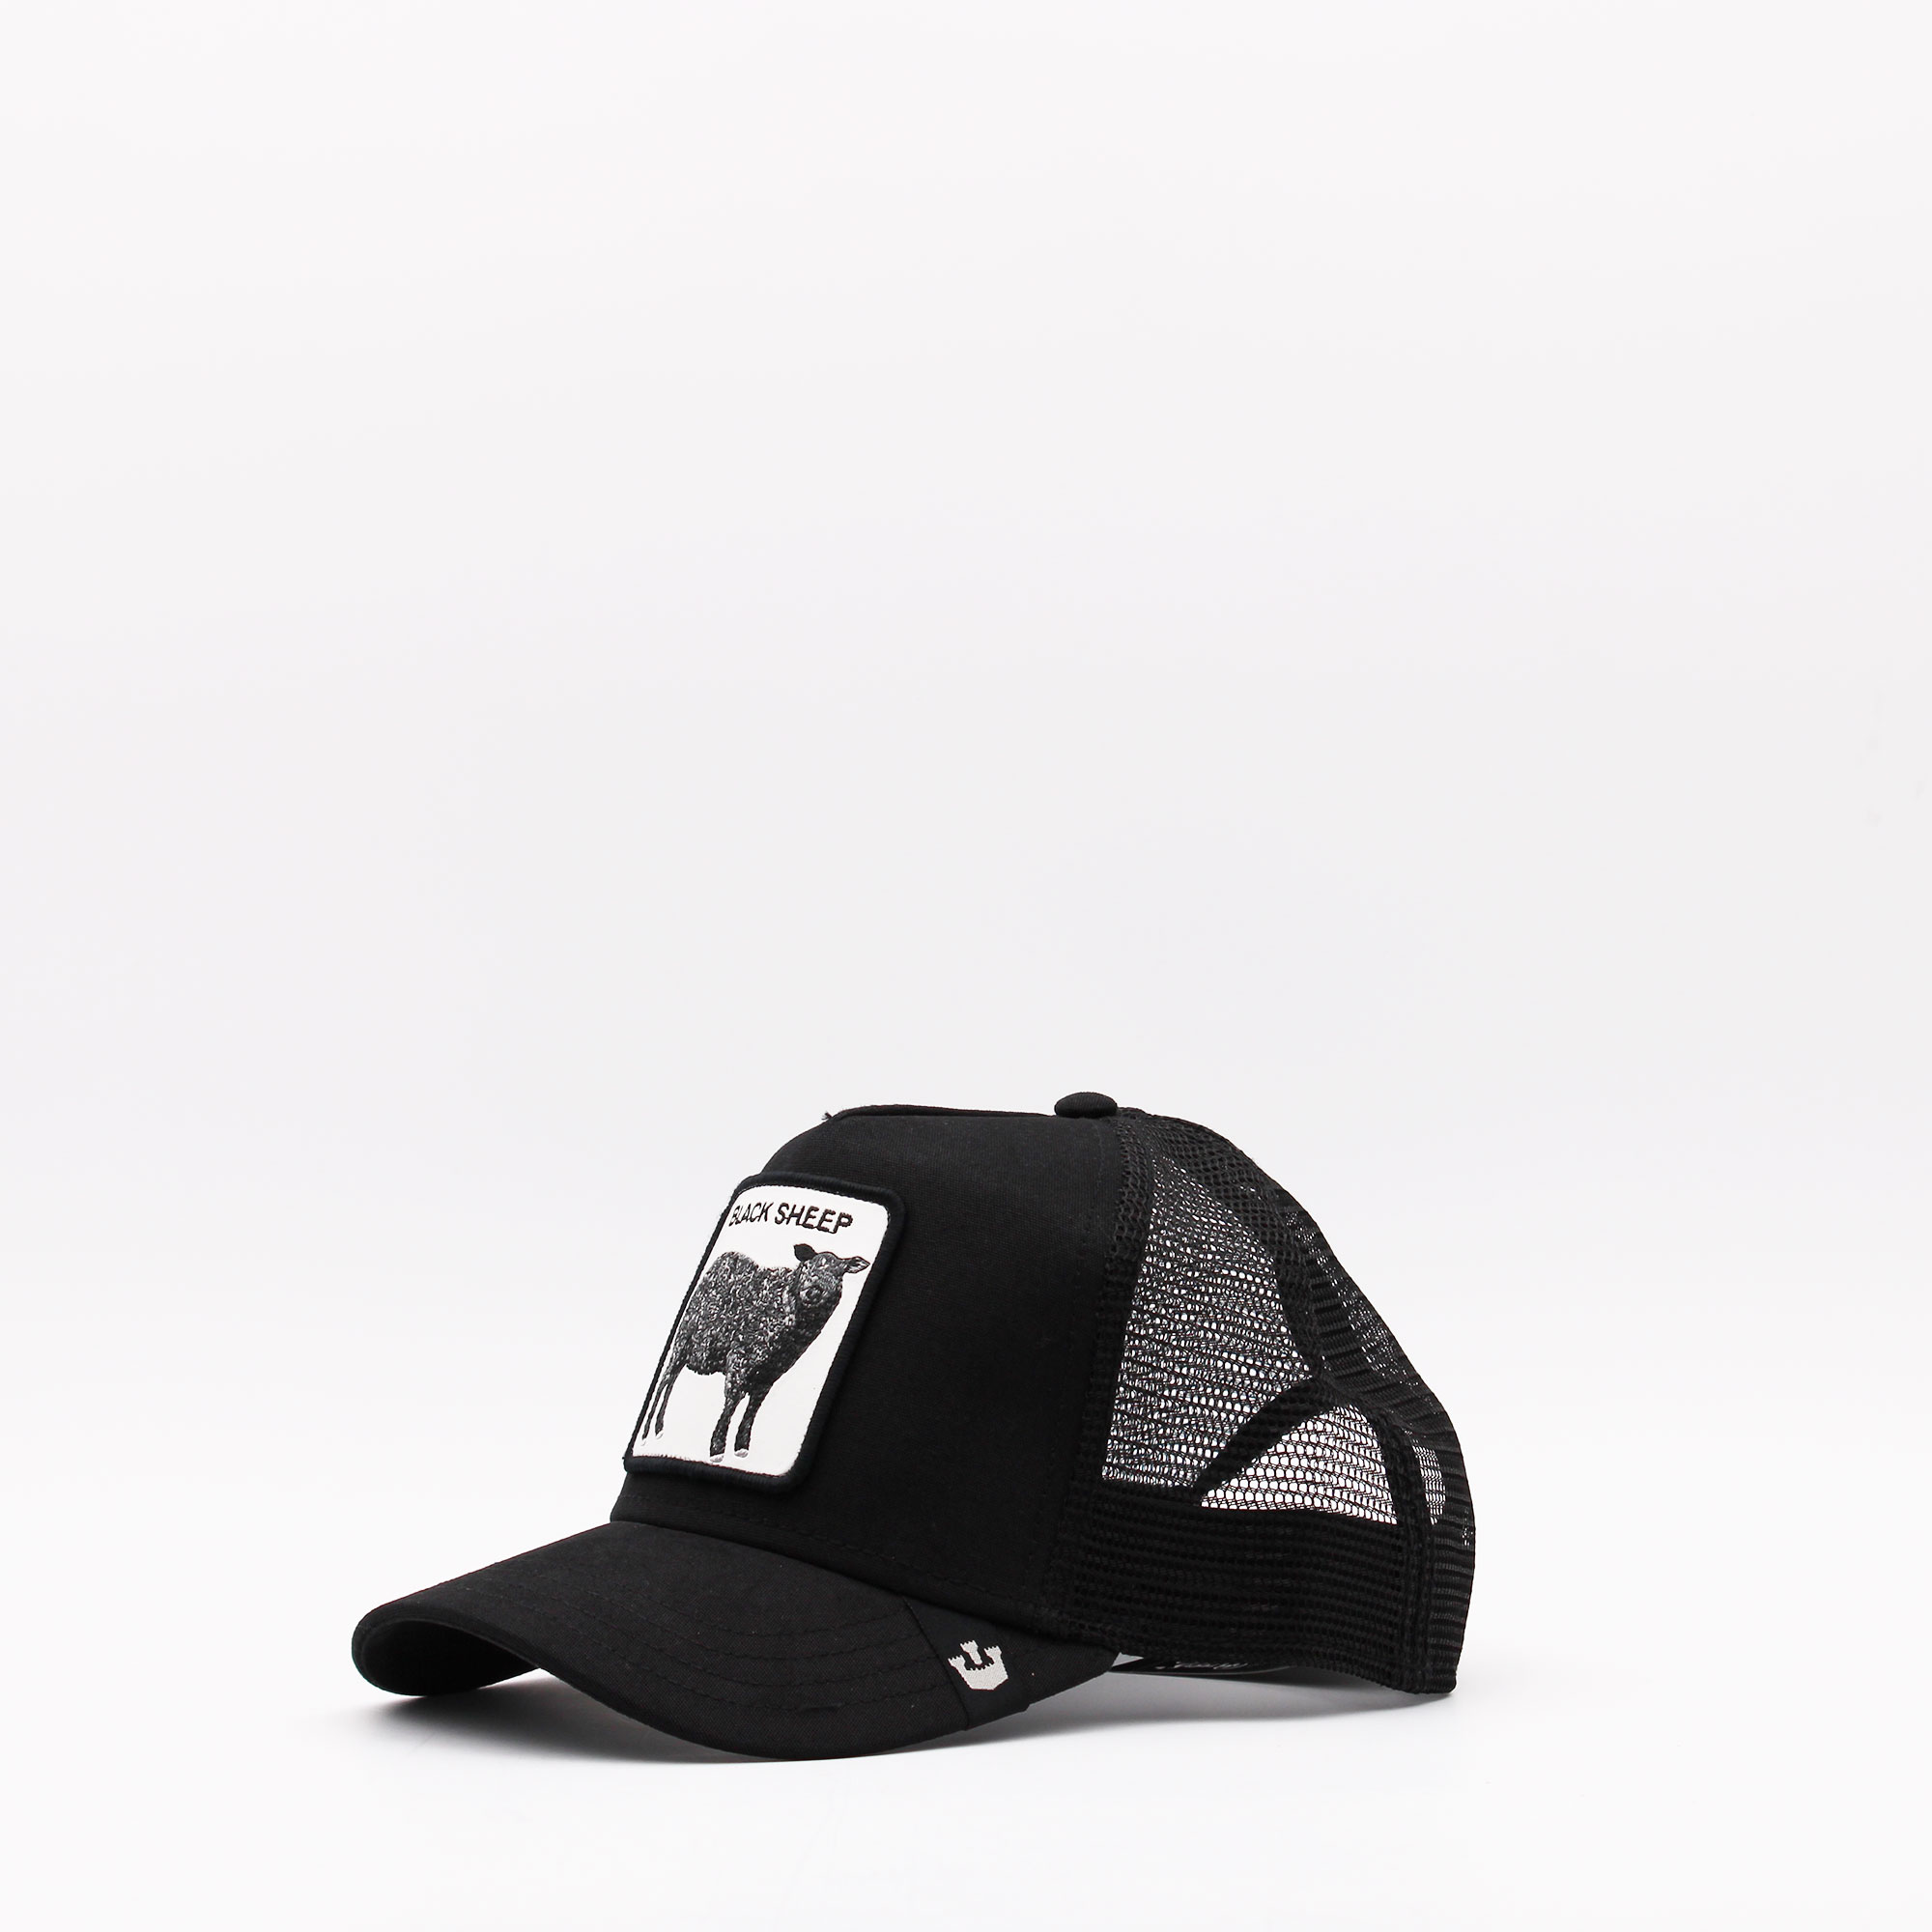 Cappello baseball black sheep - Nero